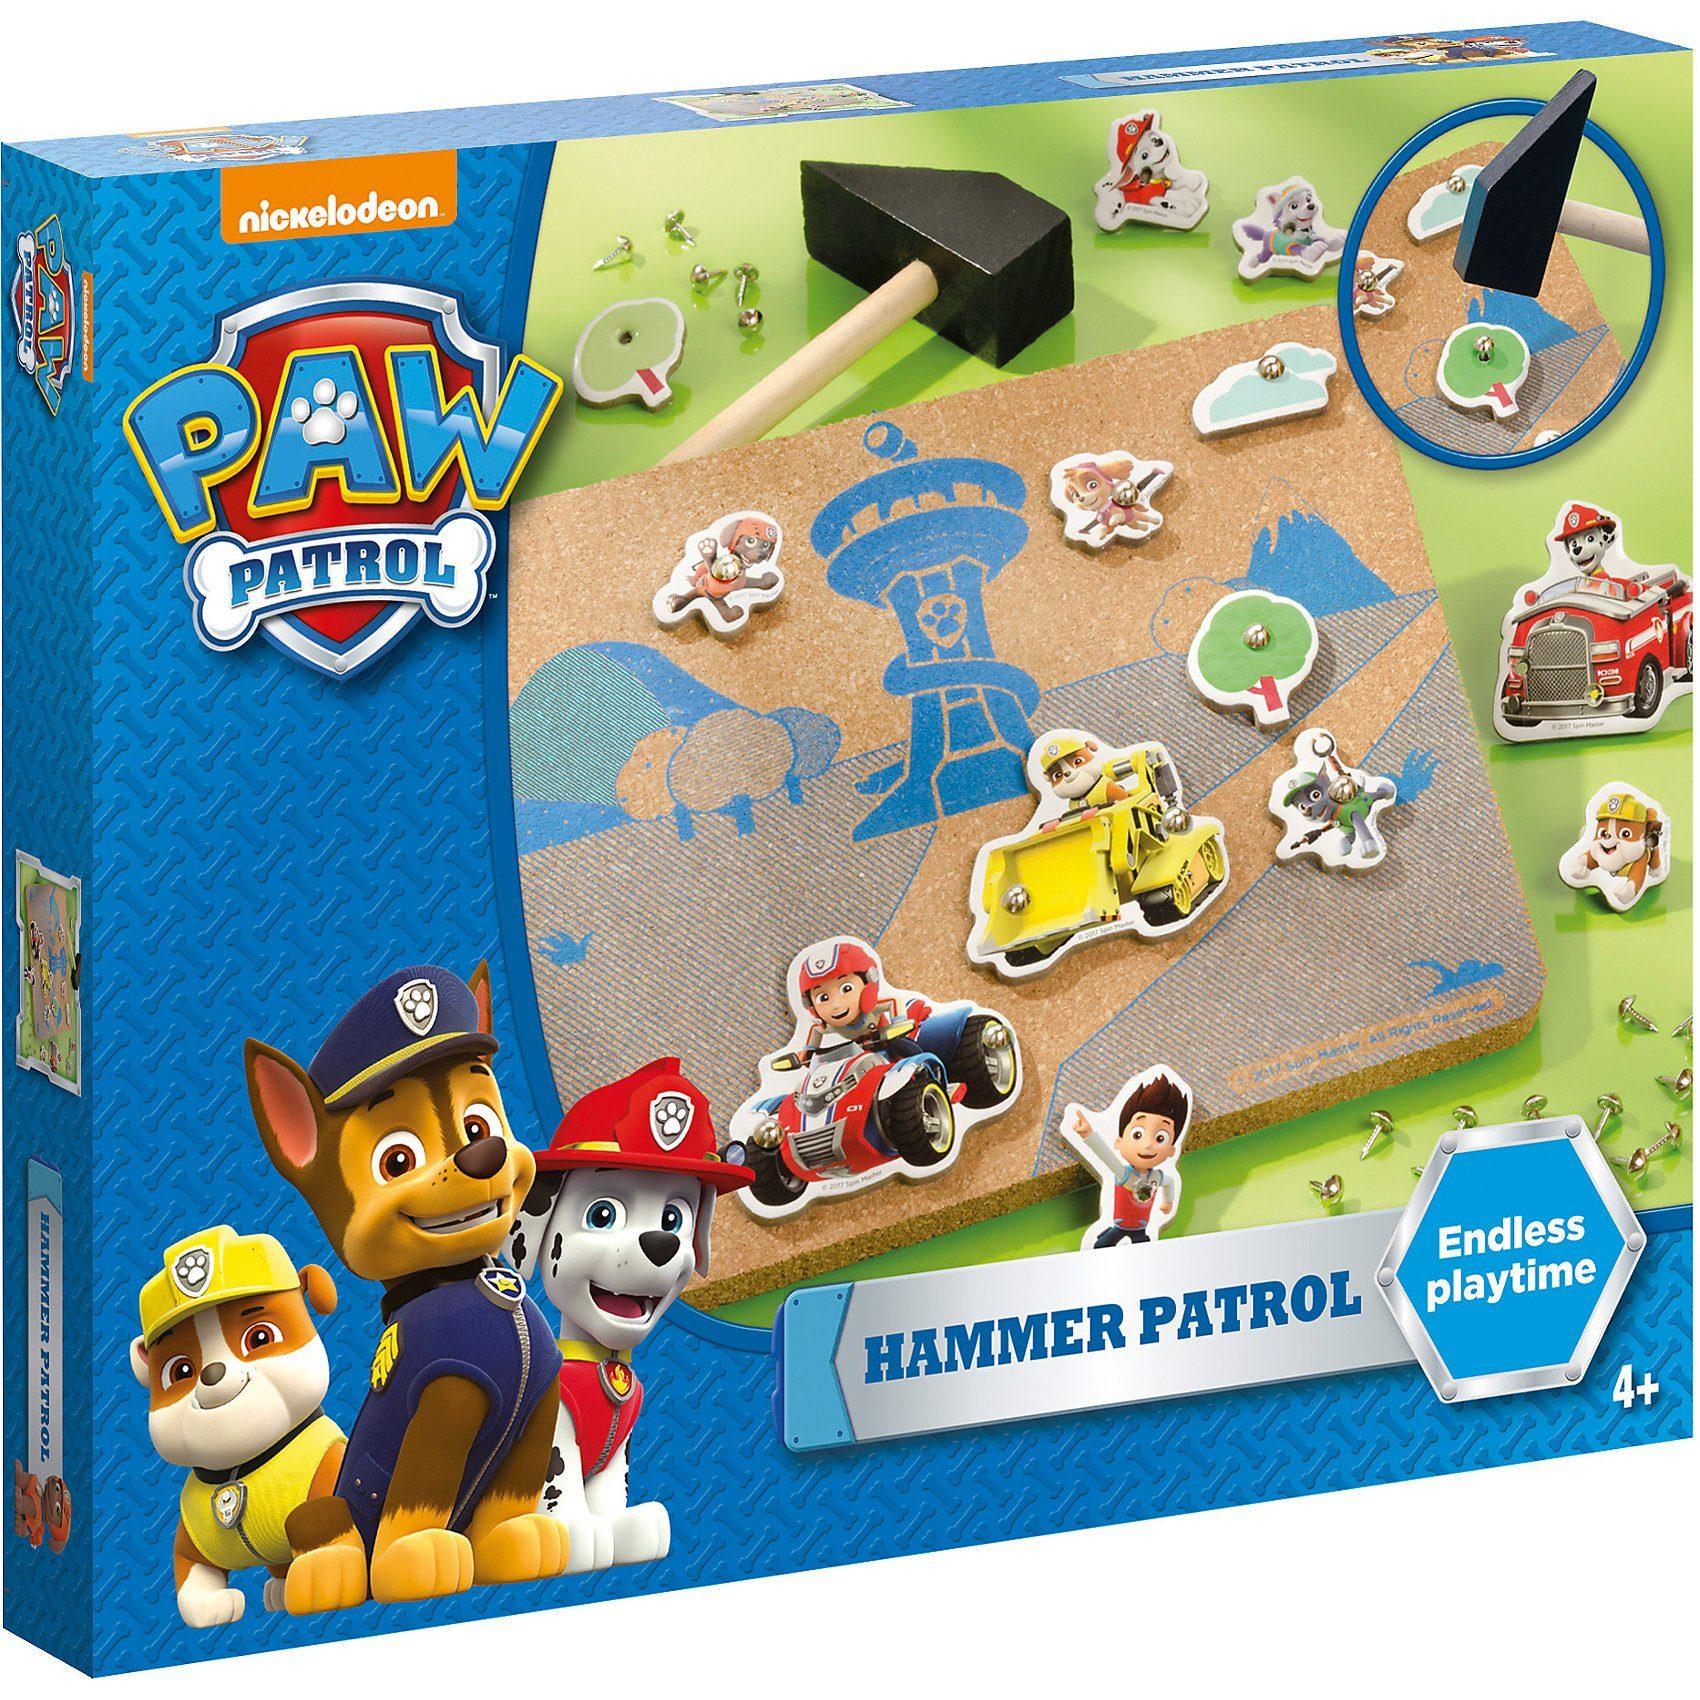 totum Paw Patrol Hammerspiel